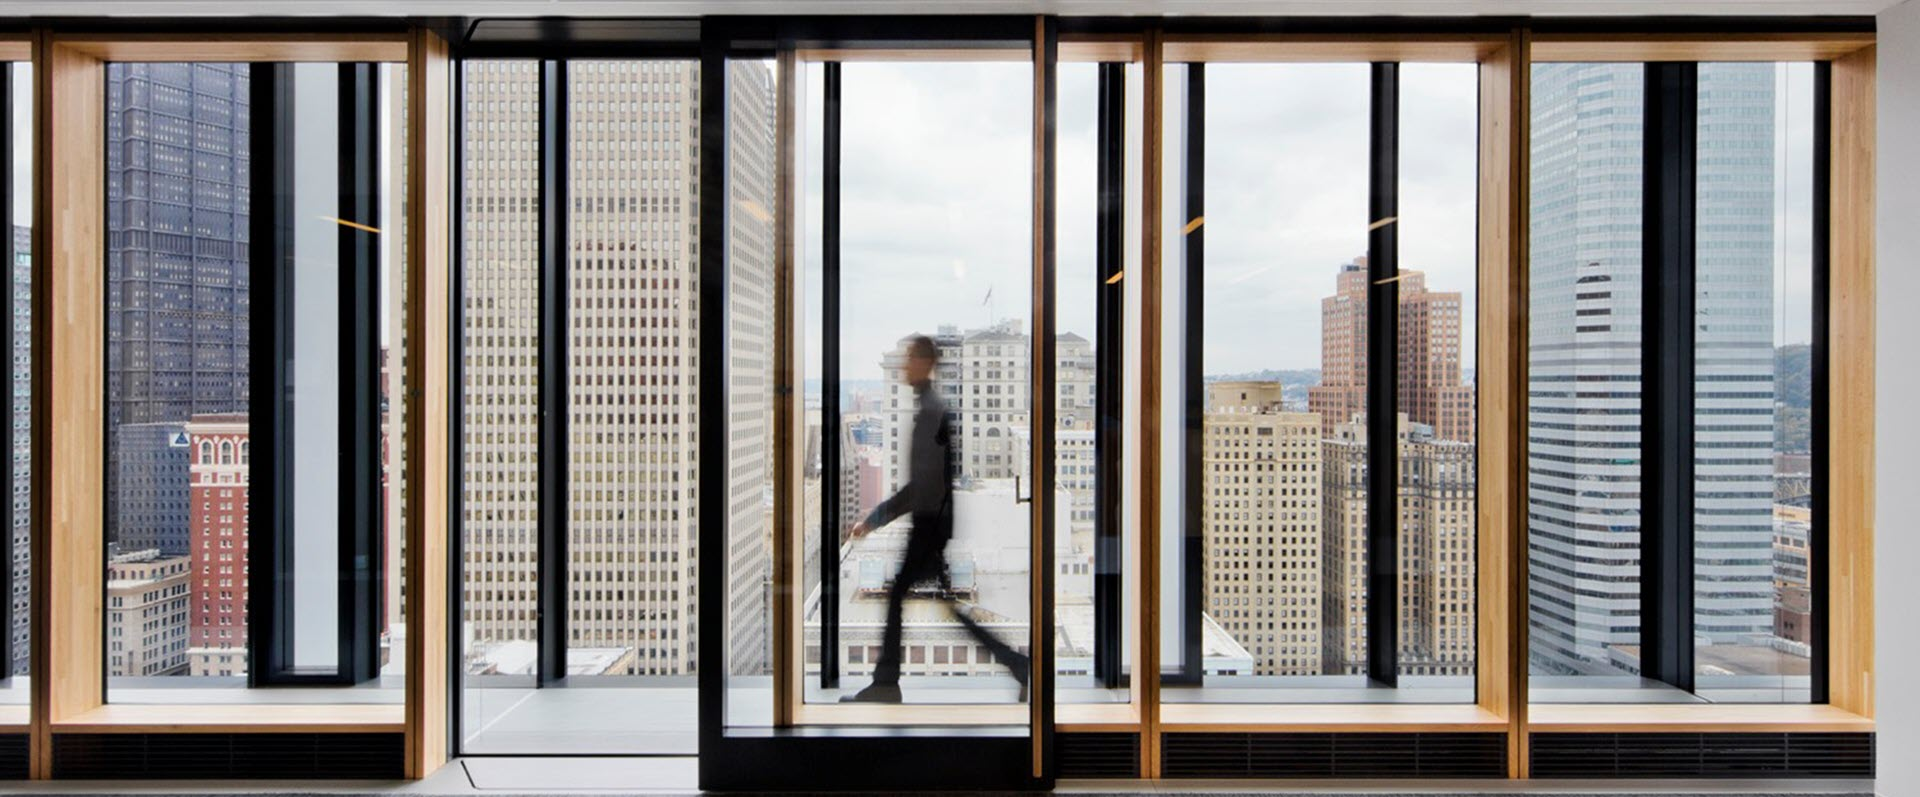 Man walking through office corridor